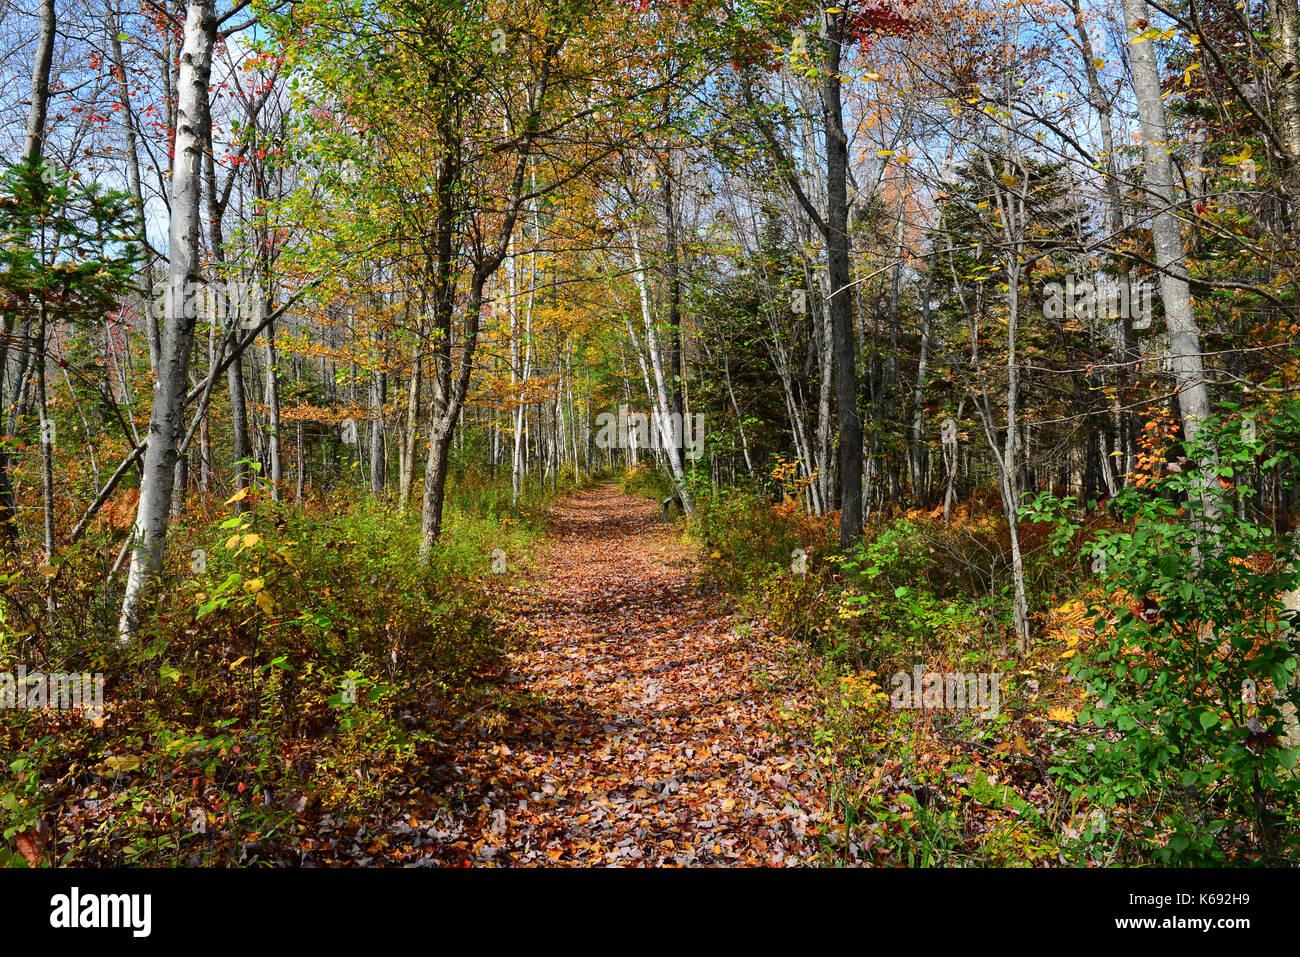 Sacandaga Pathway trail through the Adirondack wilderness in autumn in Speculator, New York, NY USA. - Stock Image